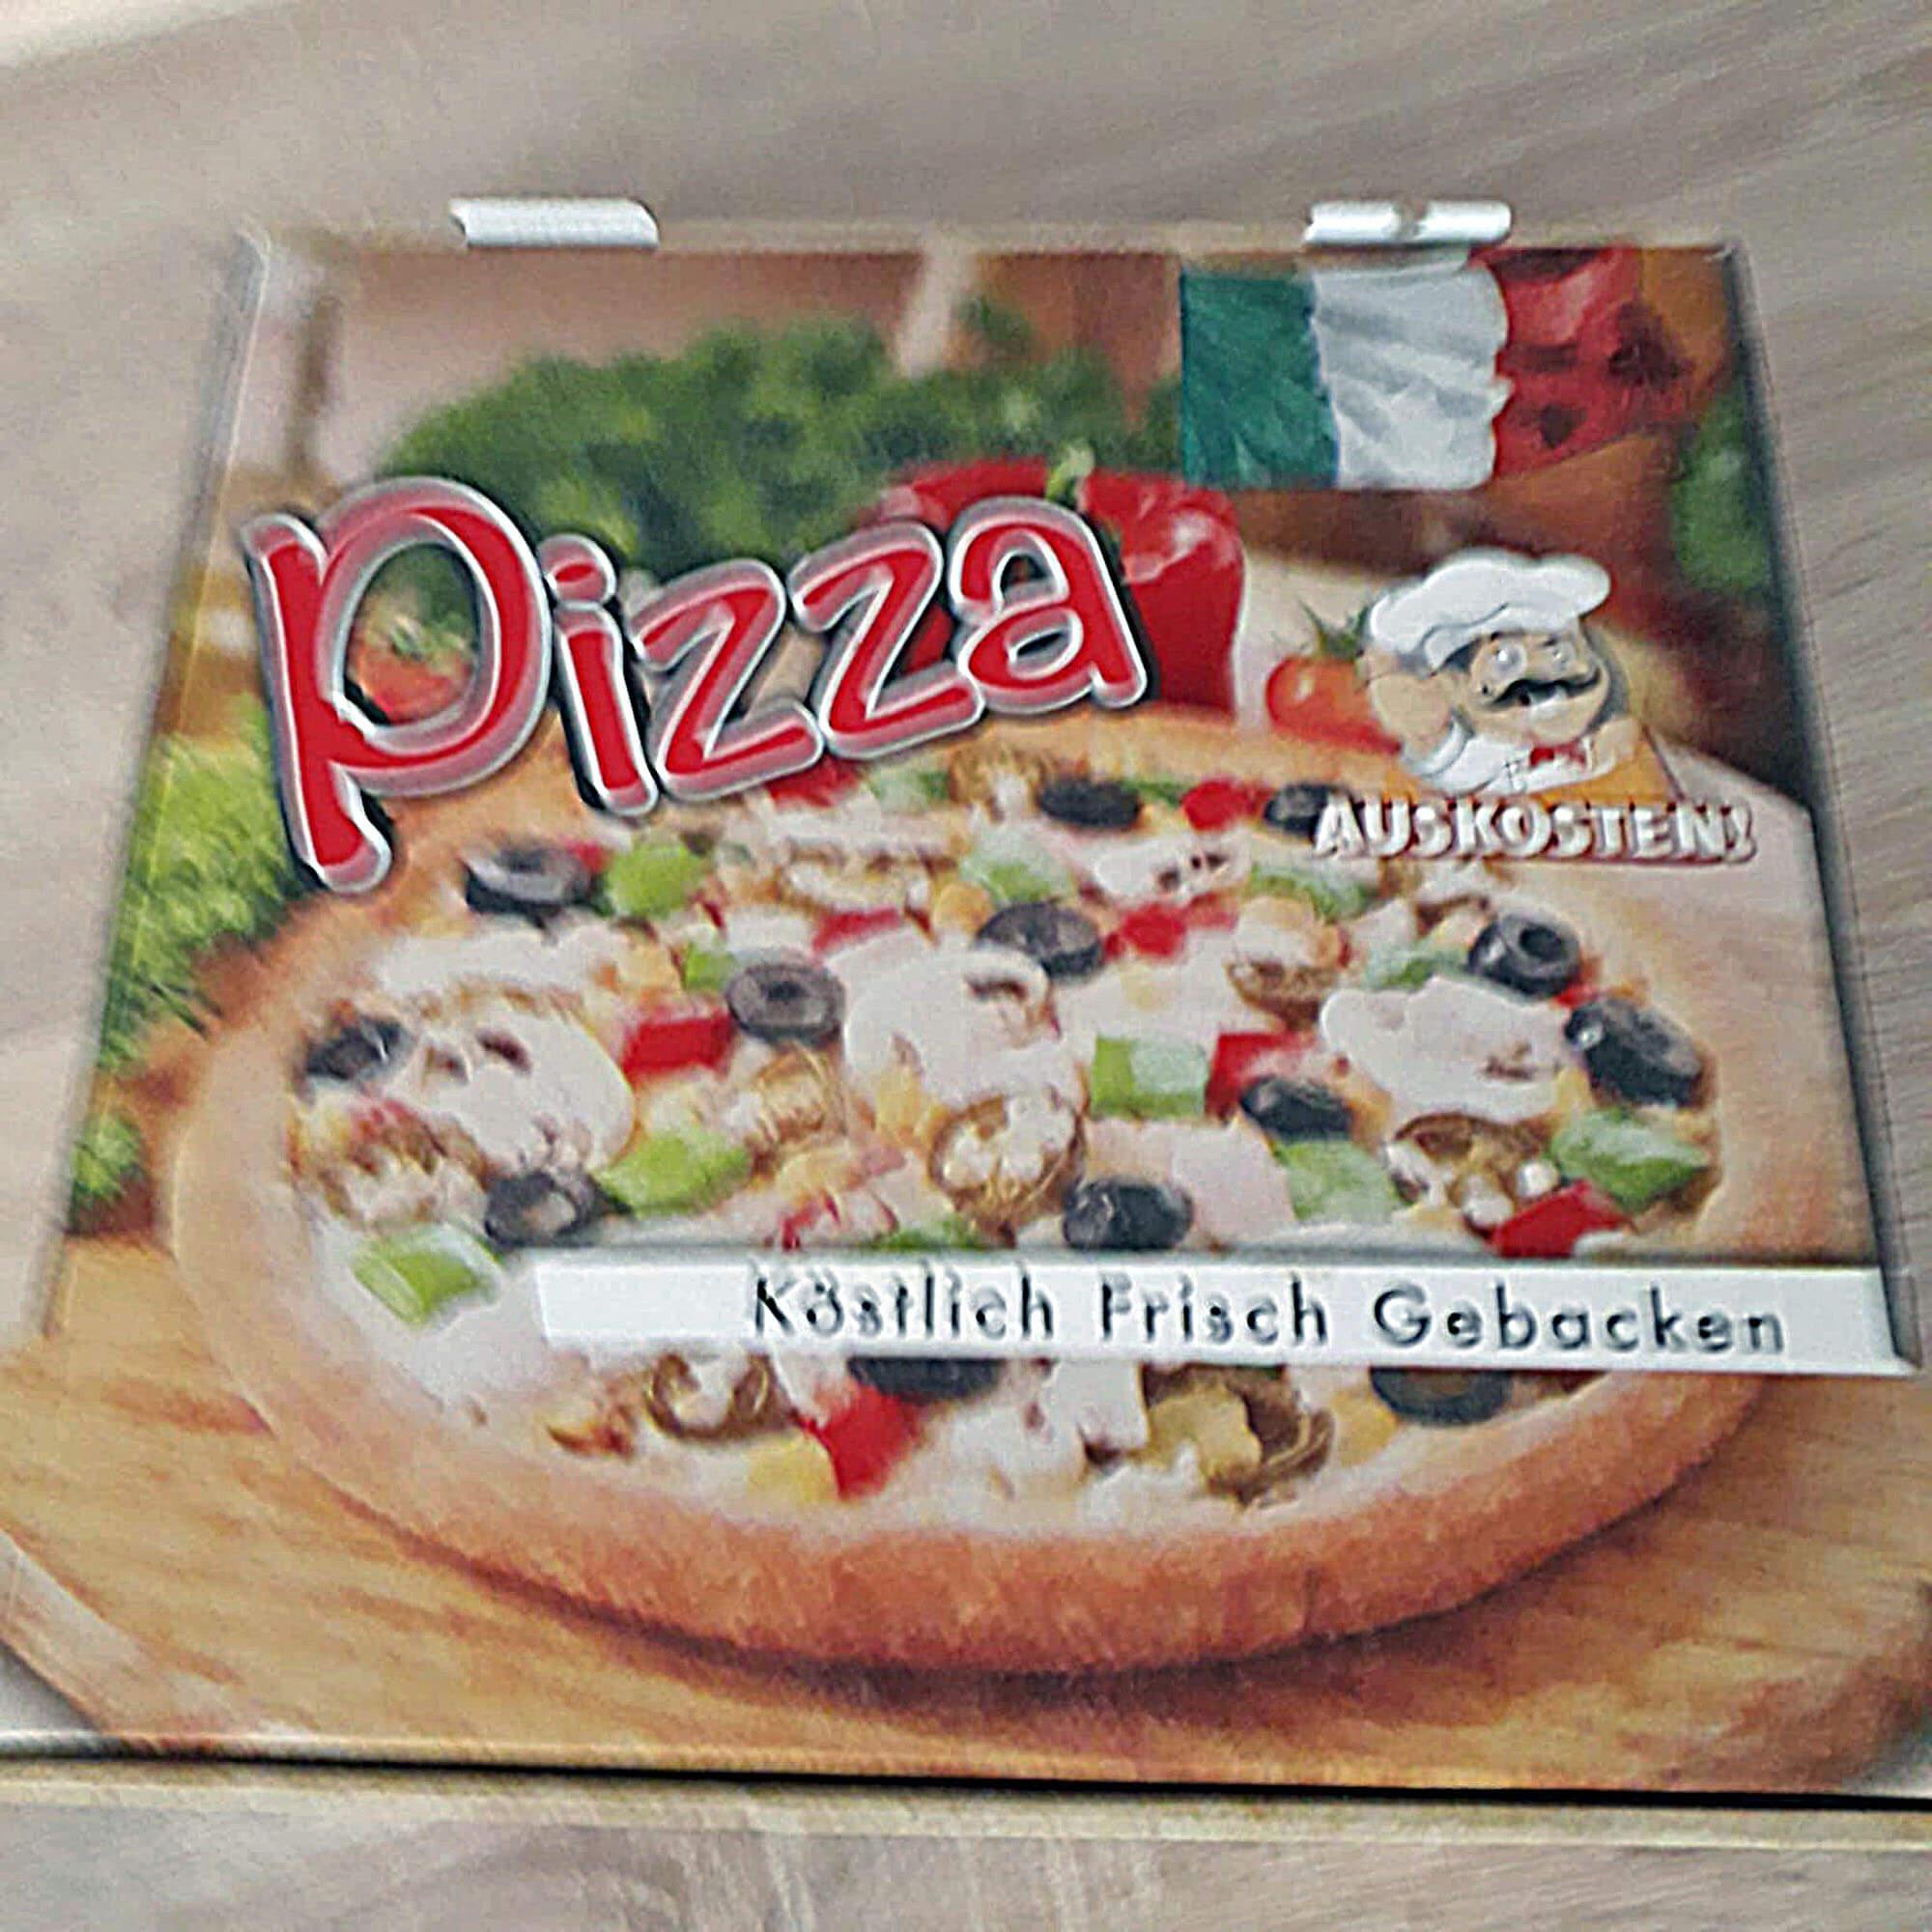 20c_Pizzakarton, R.Koss